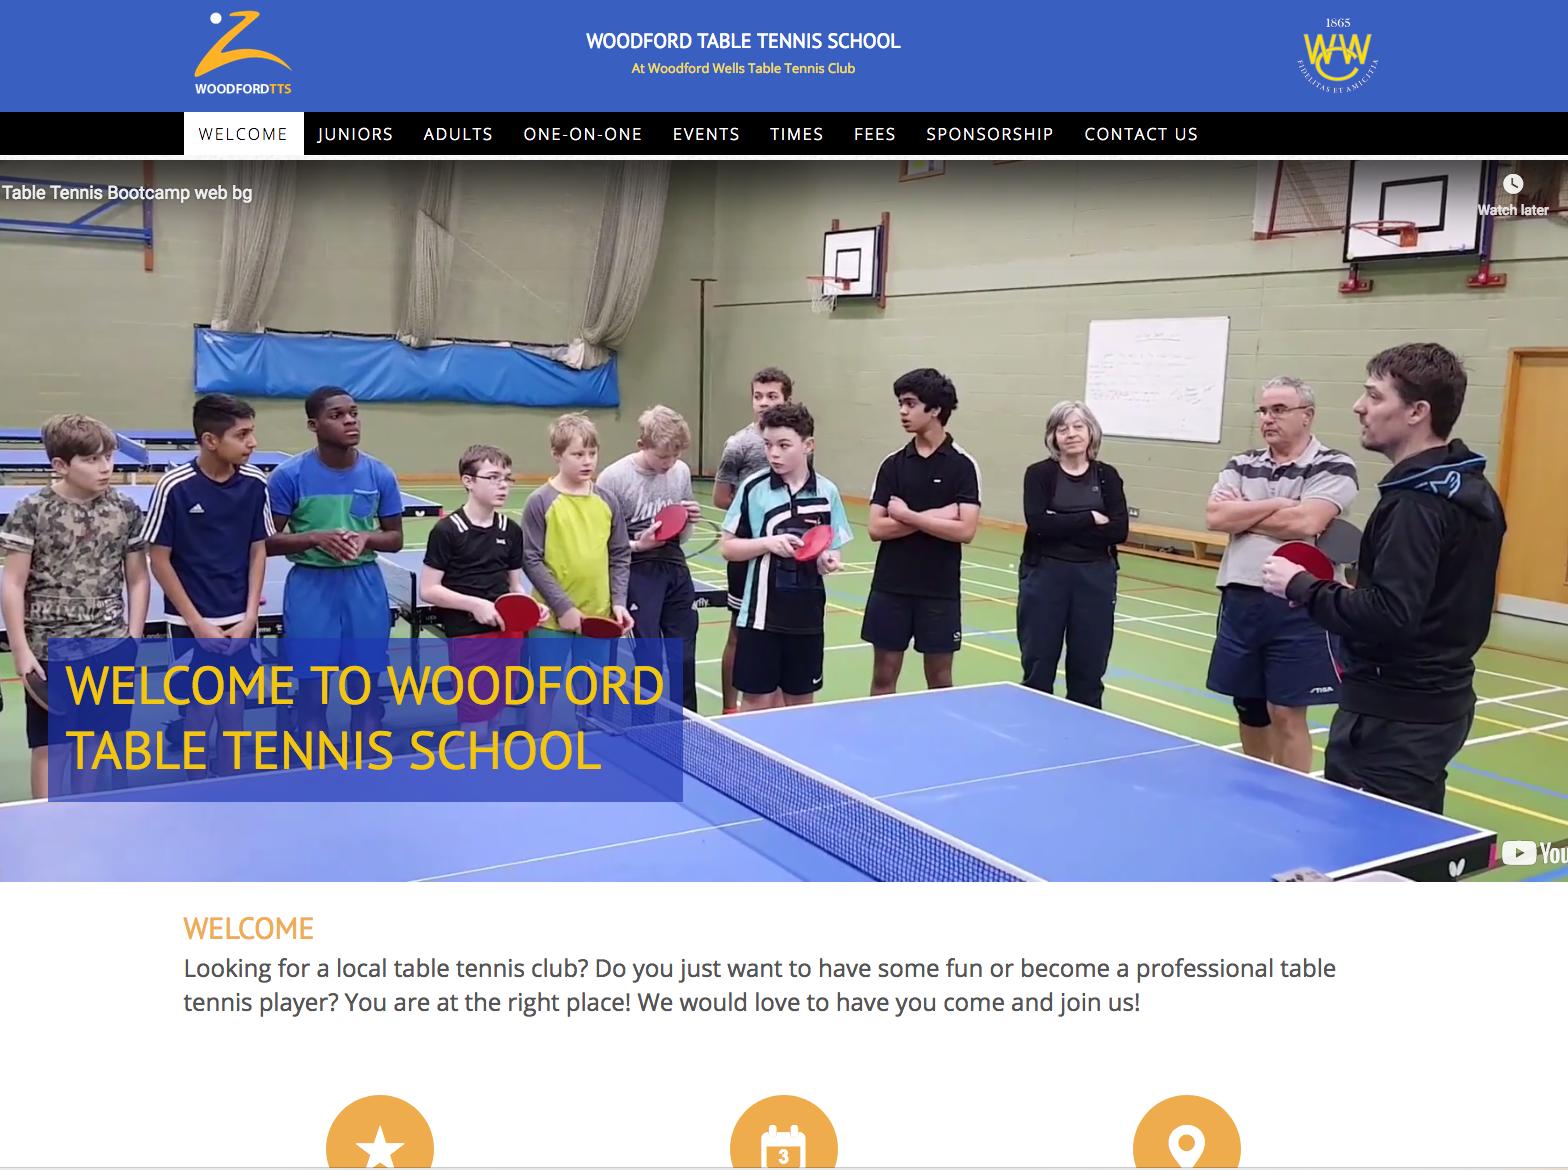 Woodford TTS website